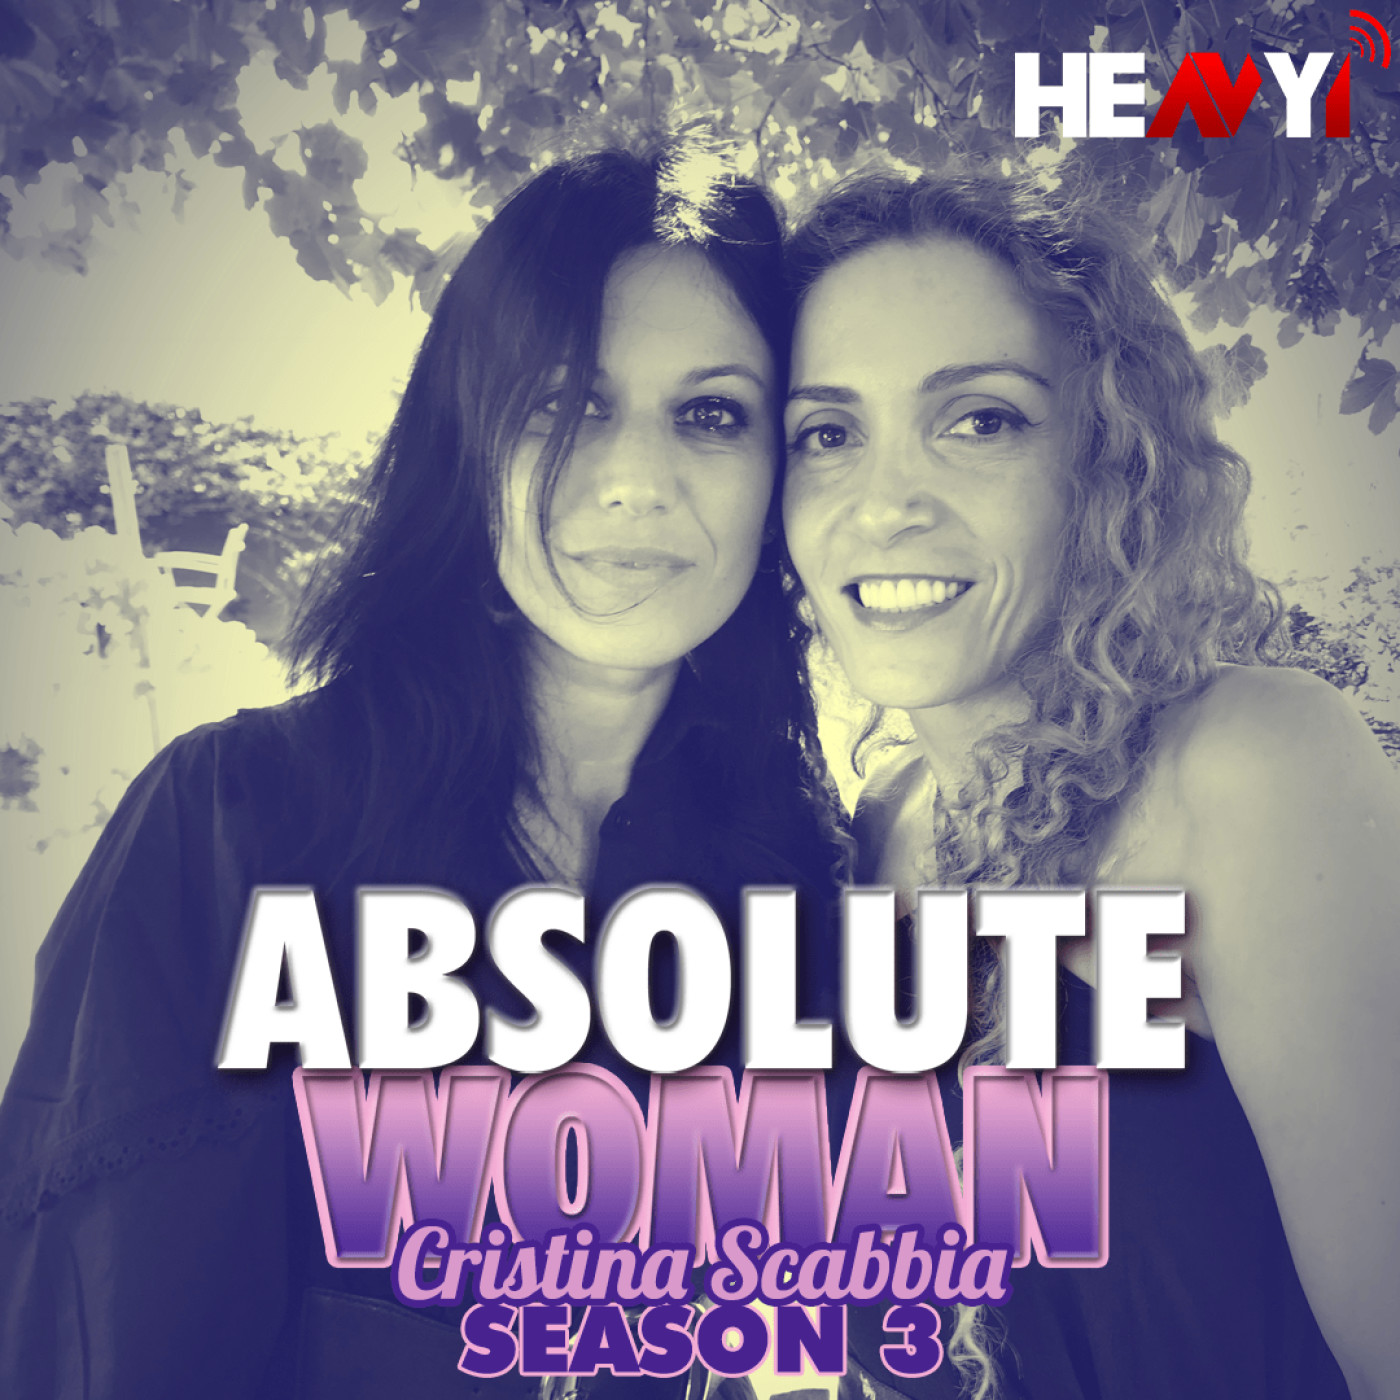 Absolute Woman : Cristina Scabbia •Lacuna Coil (Ep.2 Saison 3)